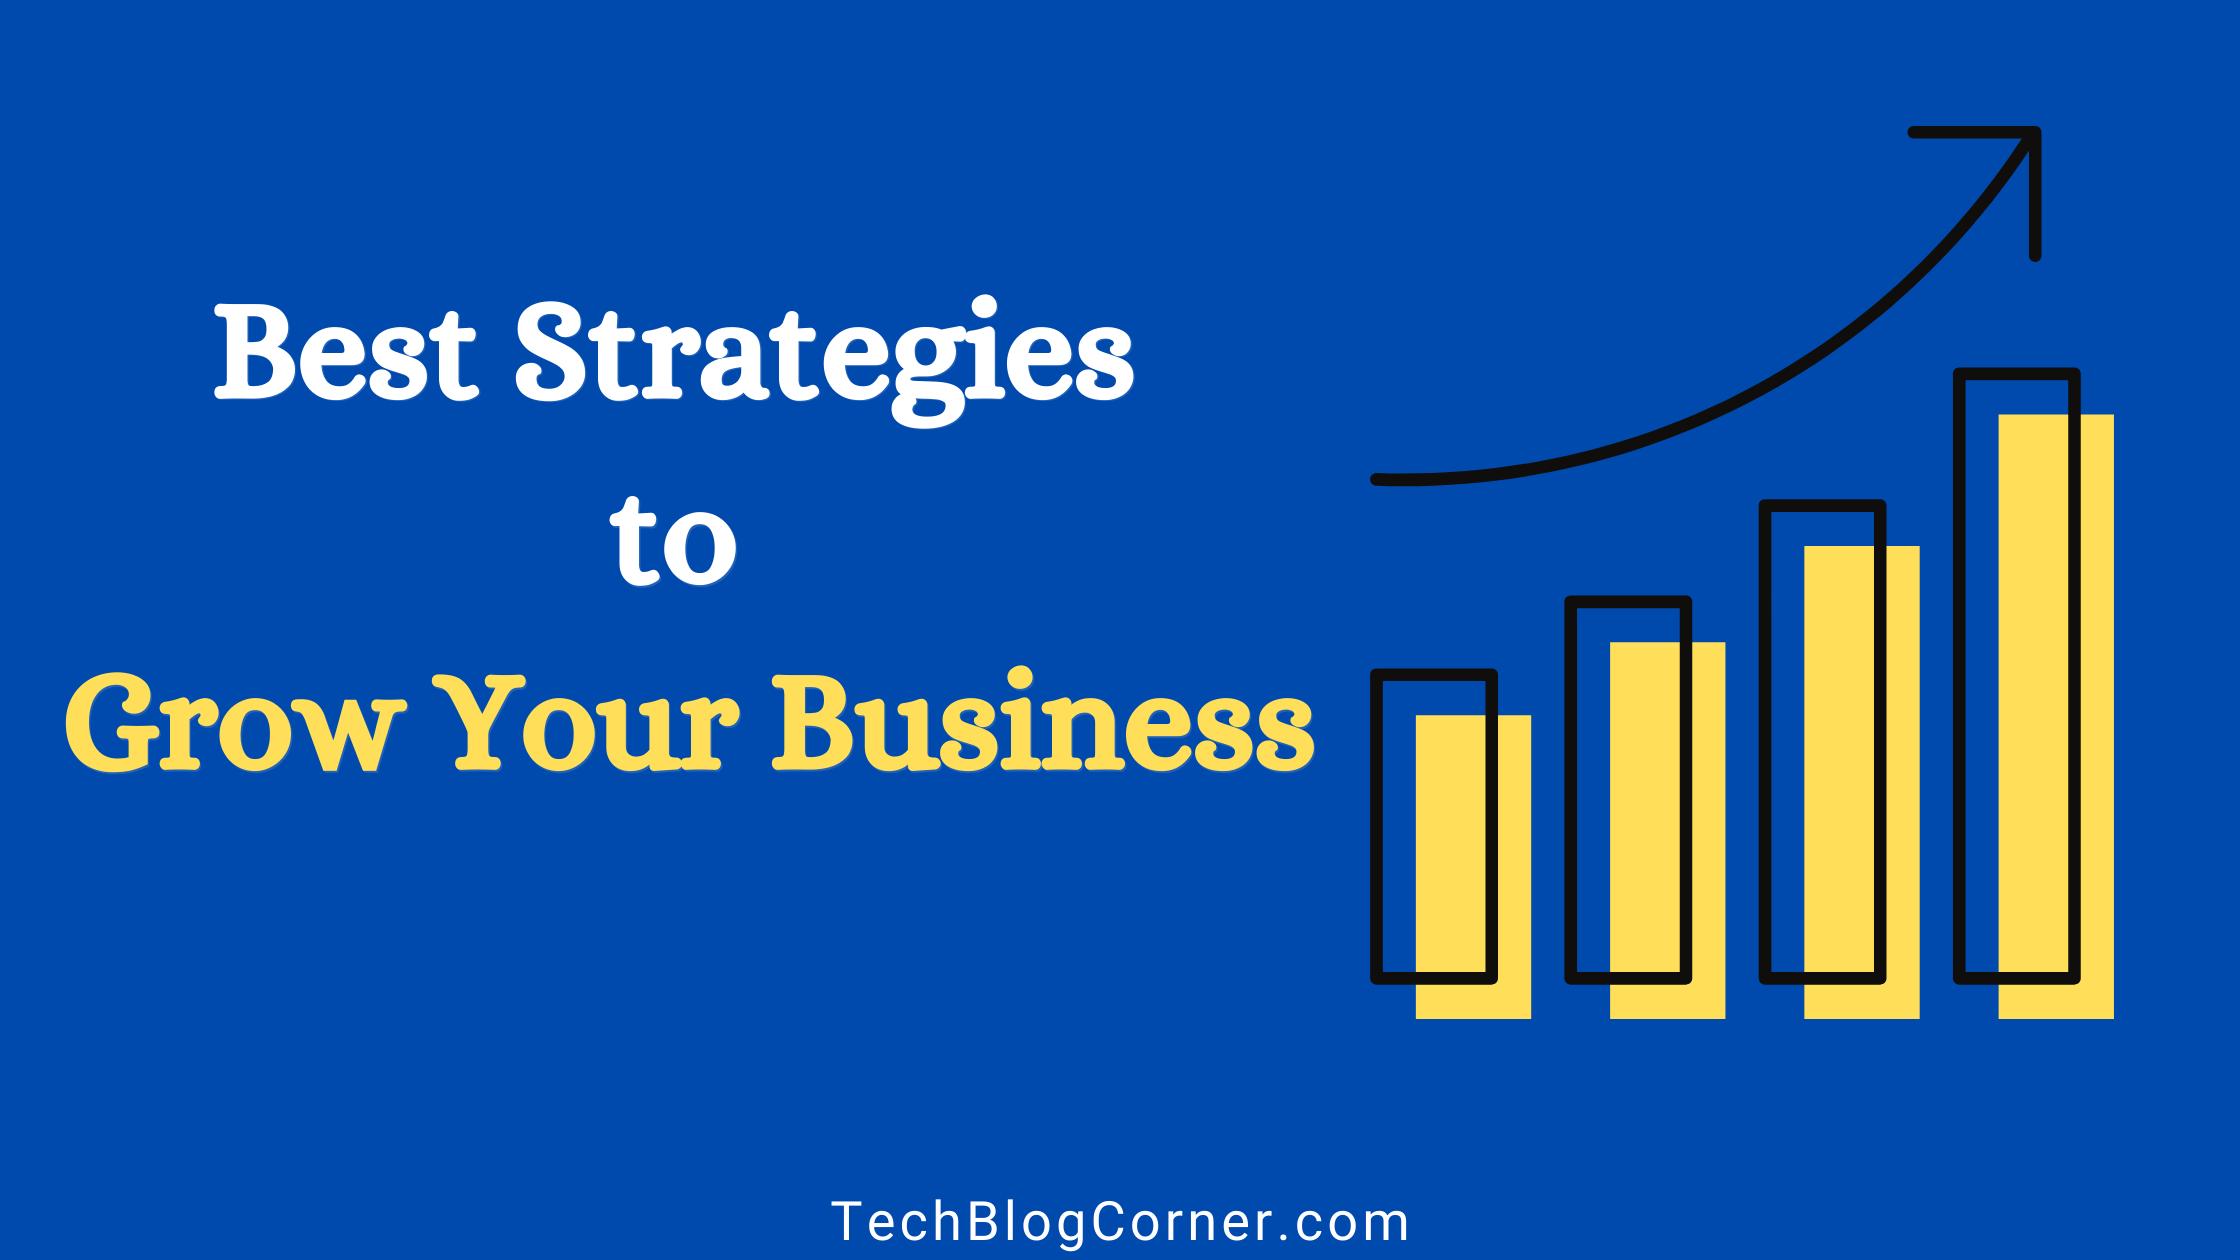 Best-Strategies-to-Grow-Business-1